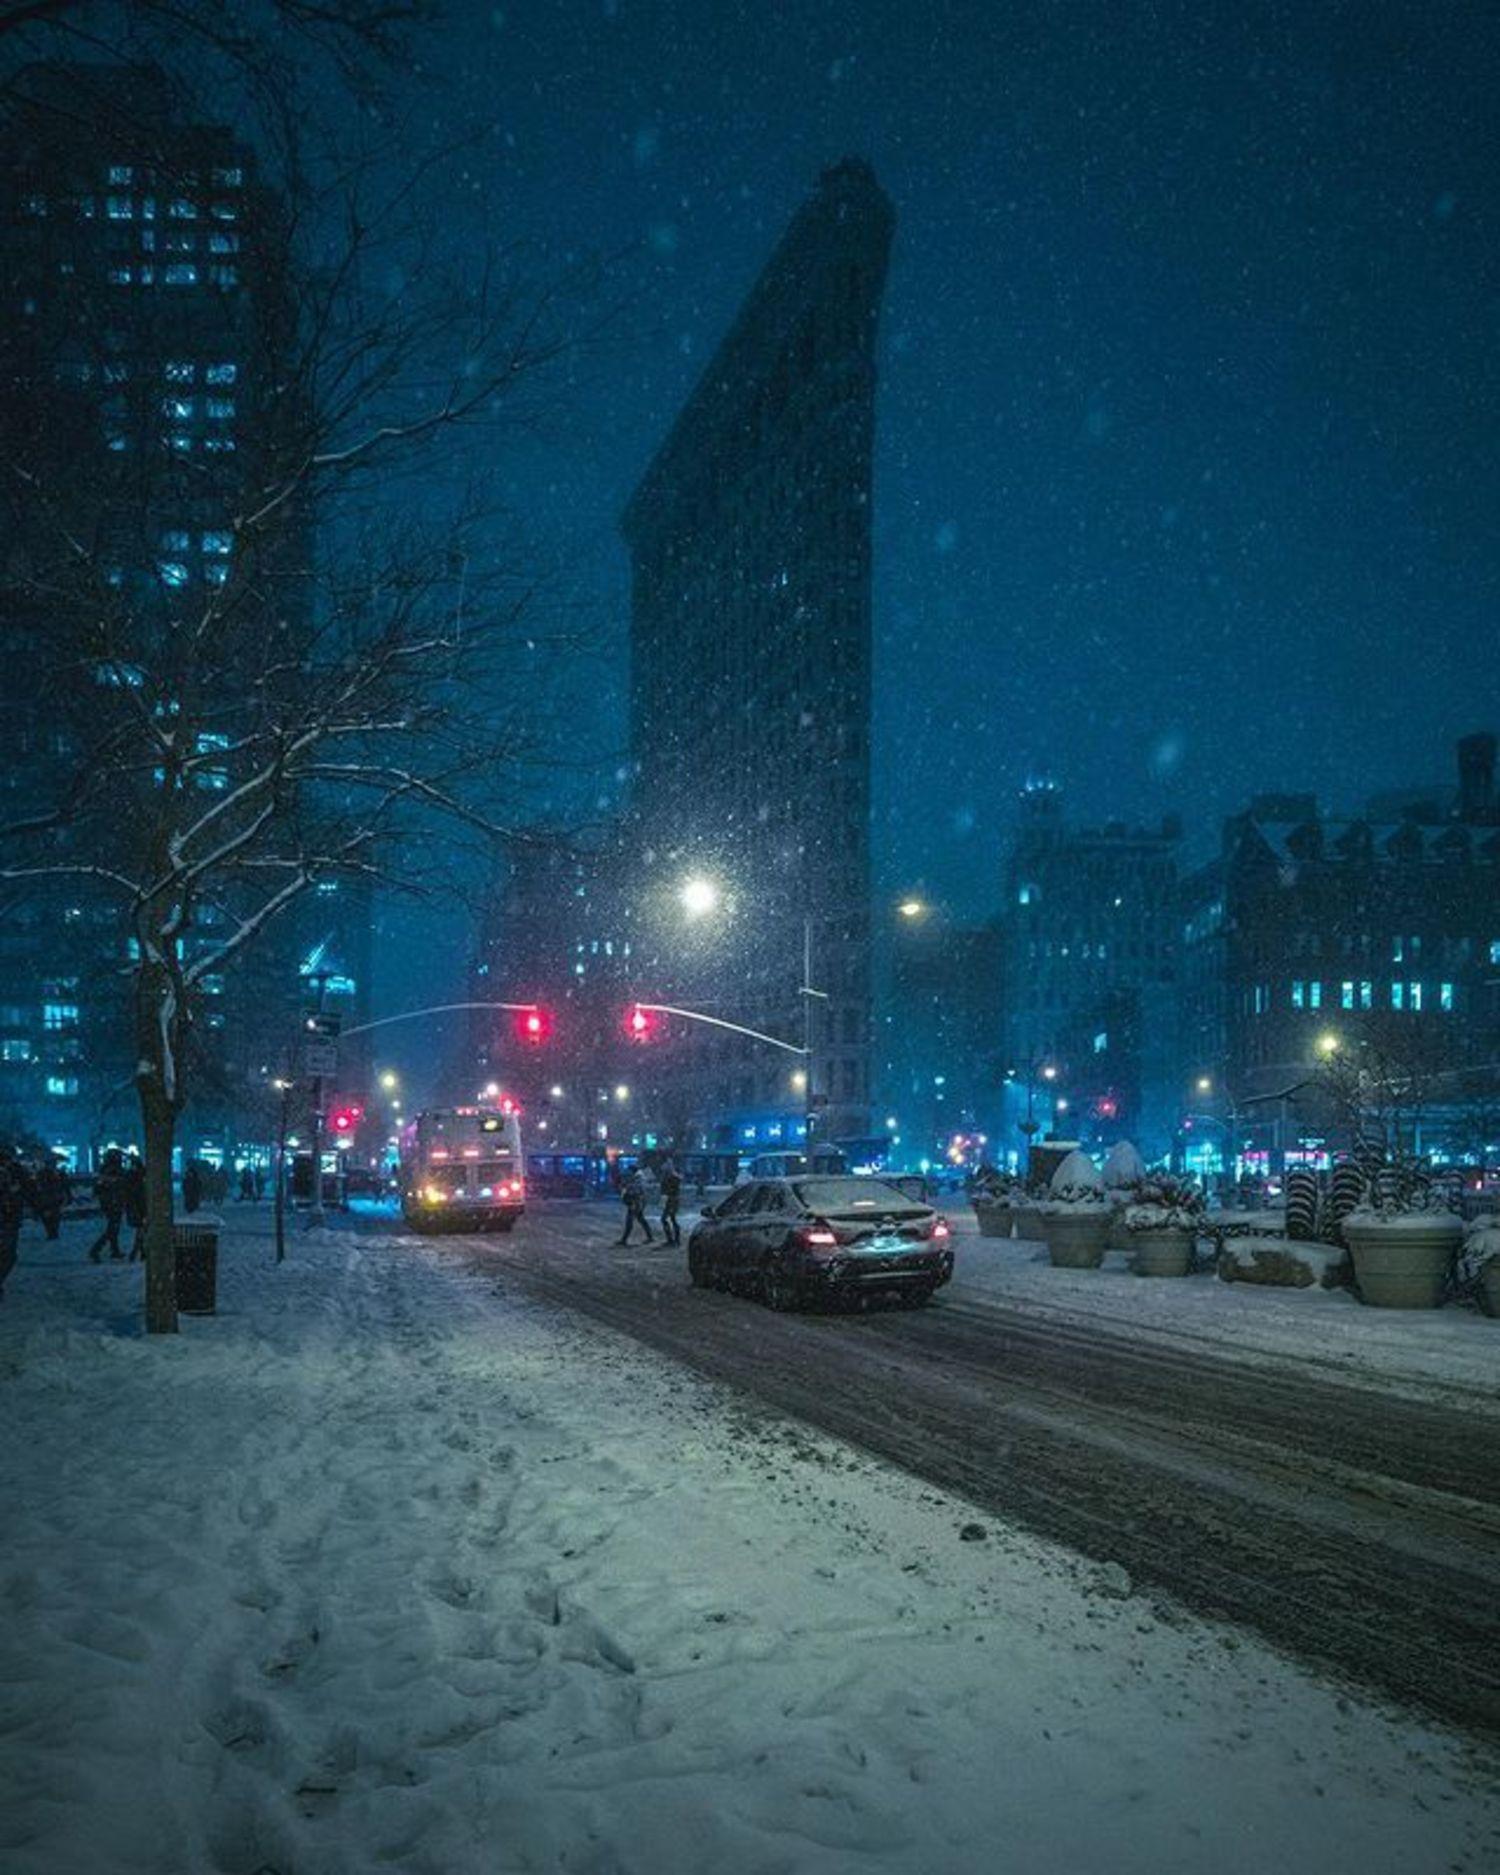 Flatiron Building and Madison Square Park, Flatiron District, Manhattan